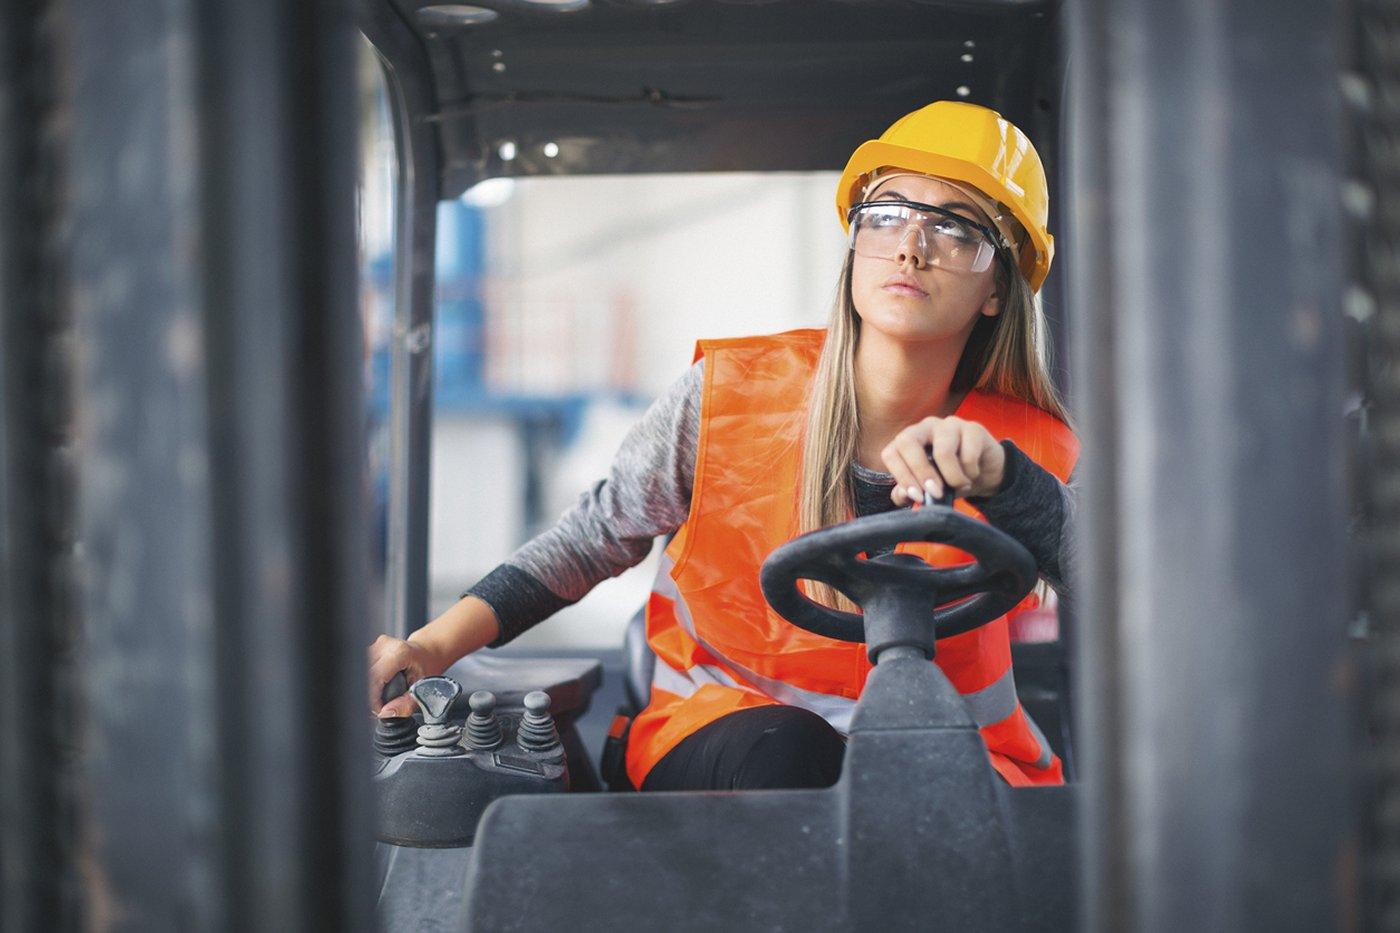 Forklift truck Finance - Woman driving forklift truck